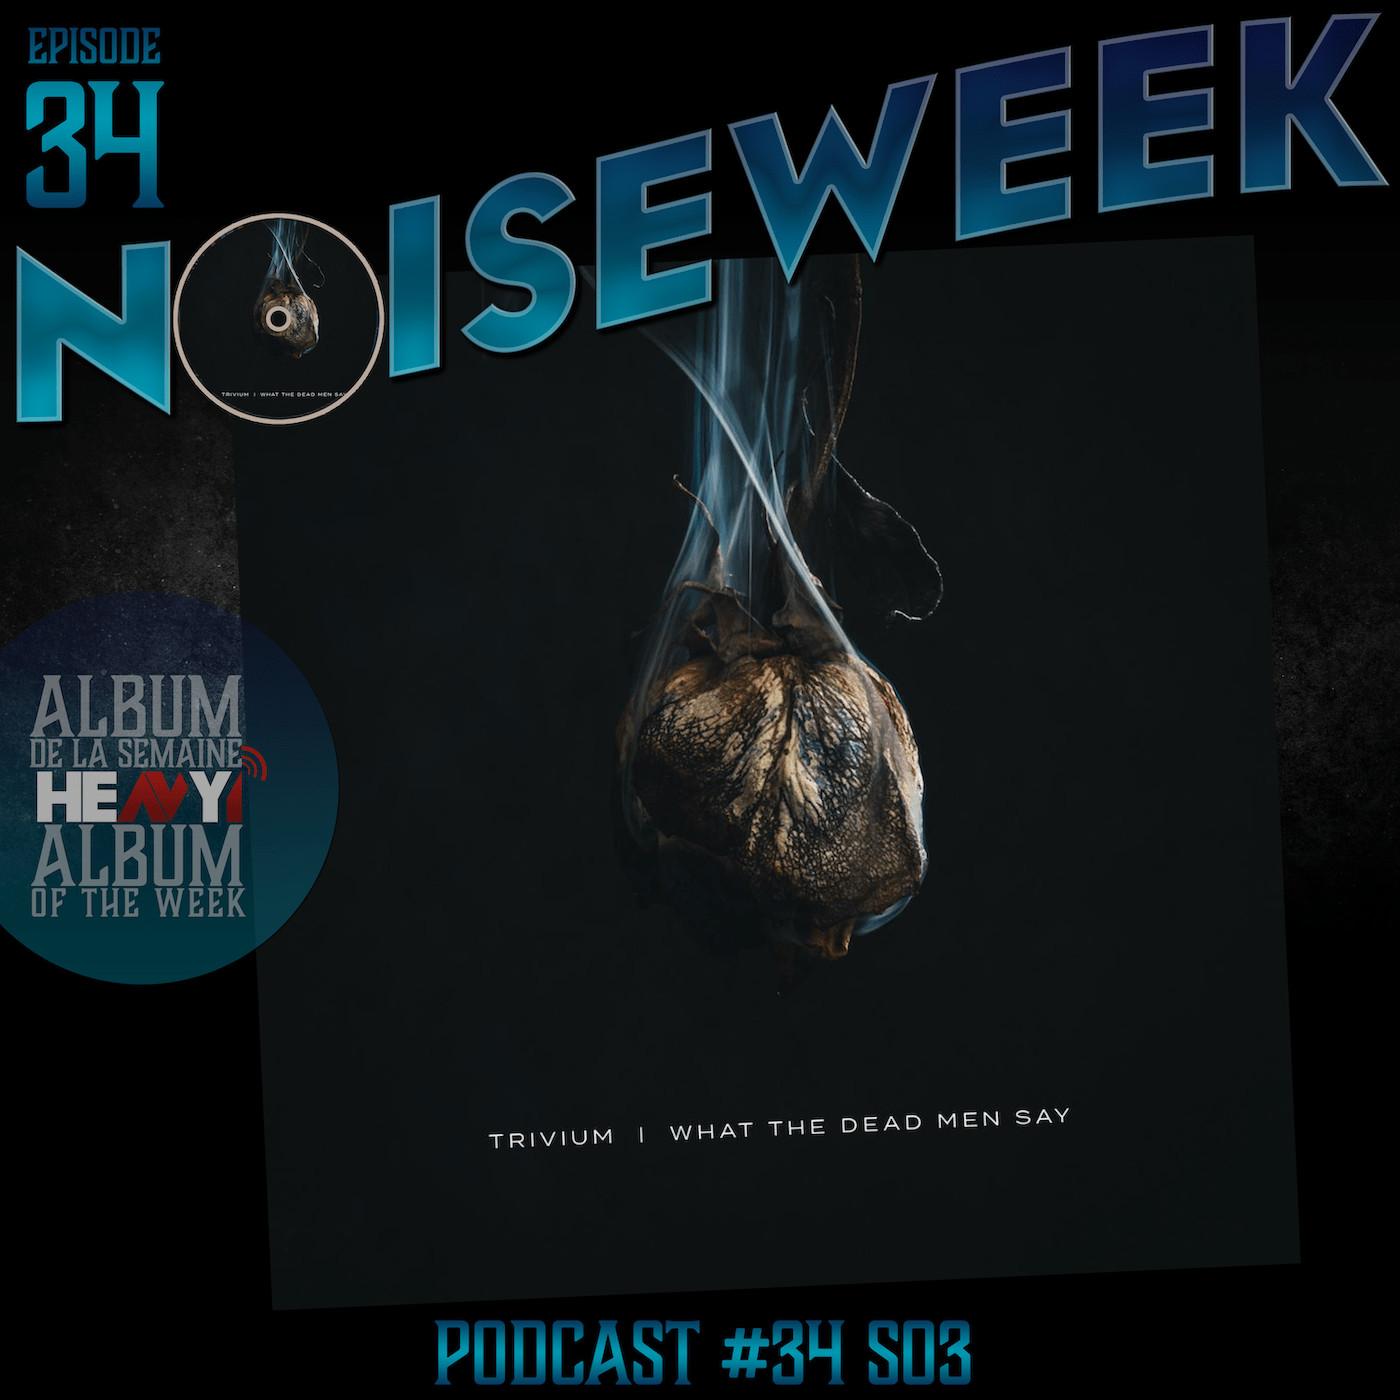 Noiseweek #34 Saison 3